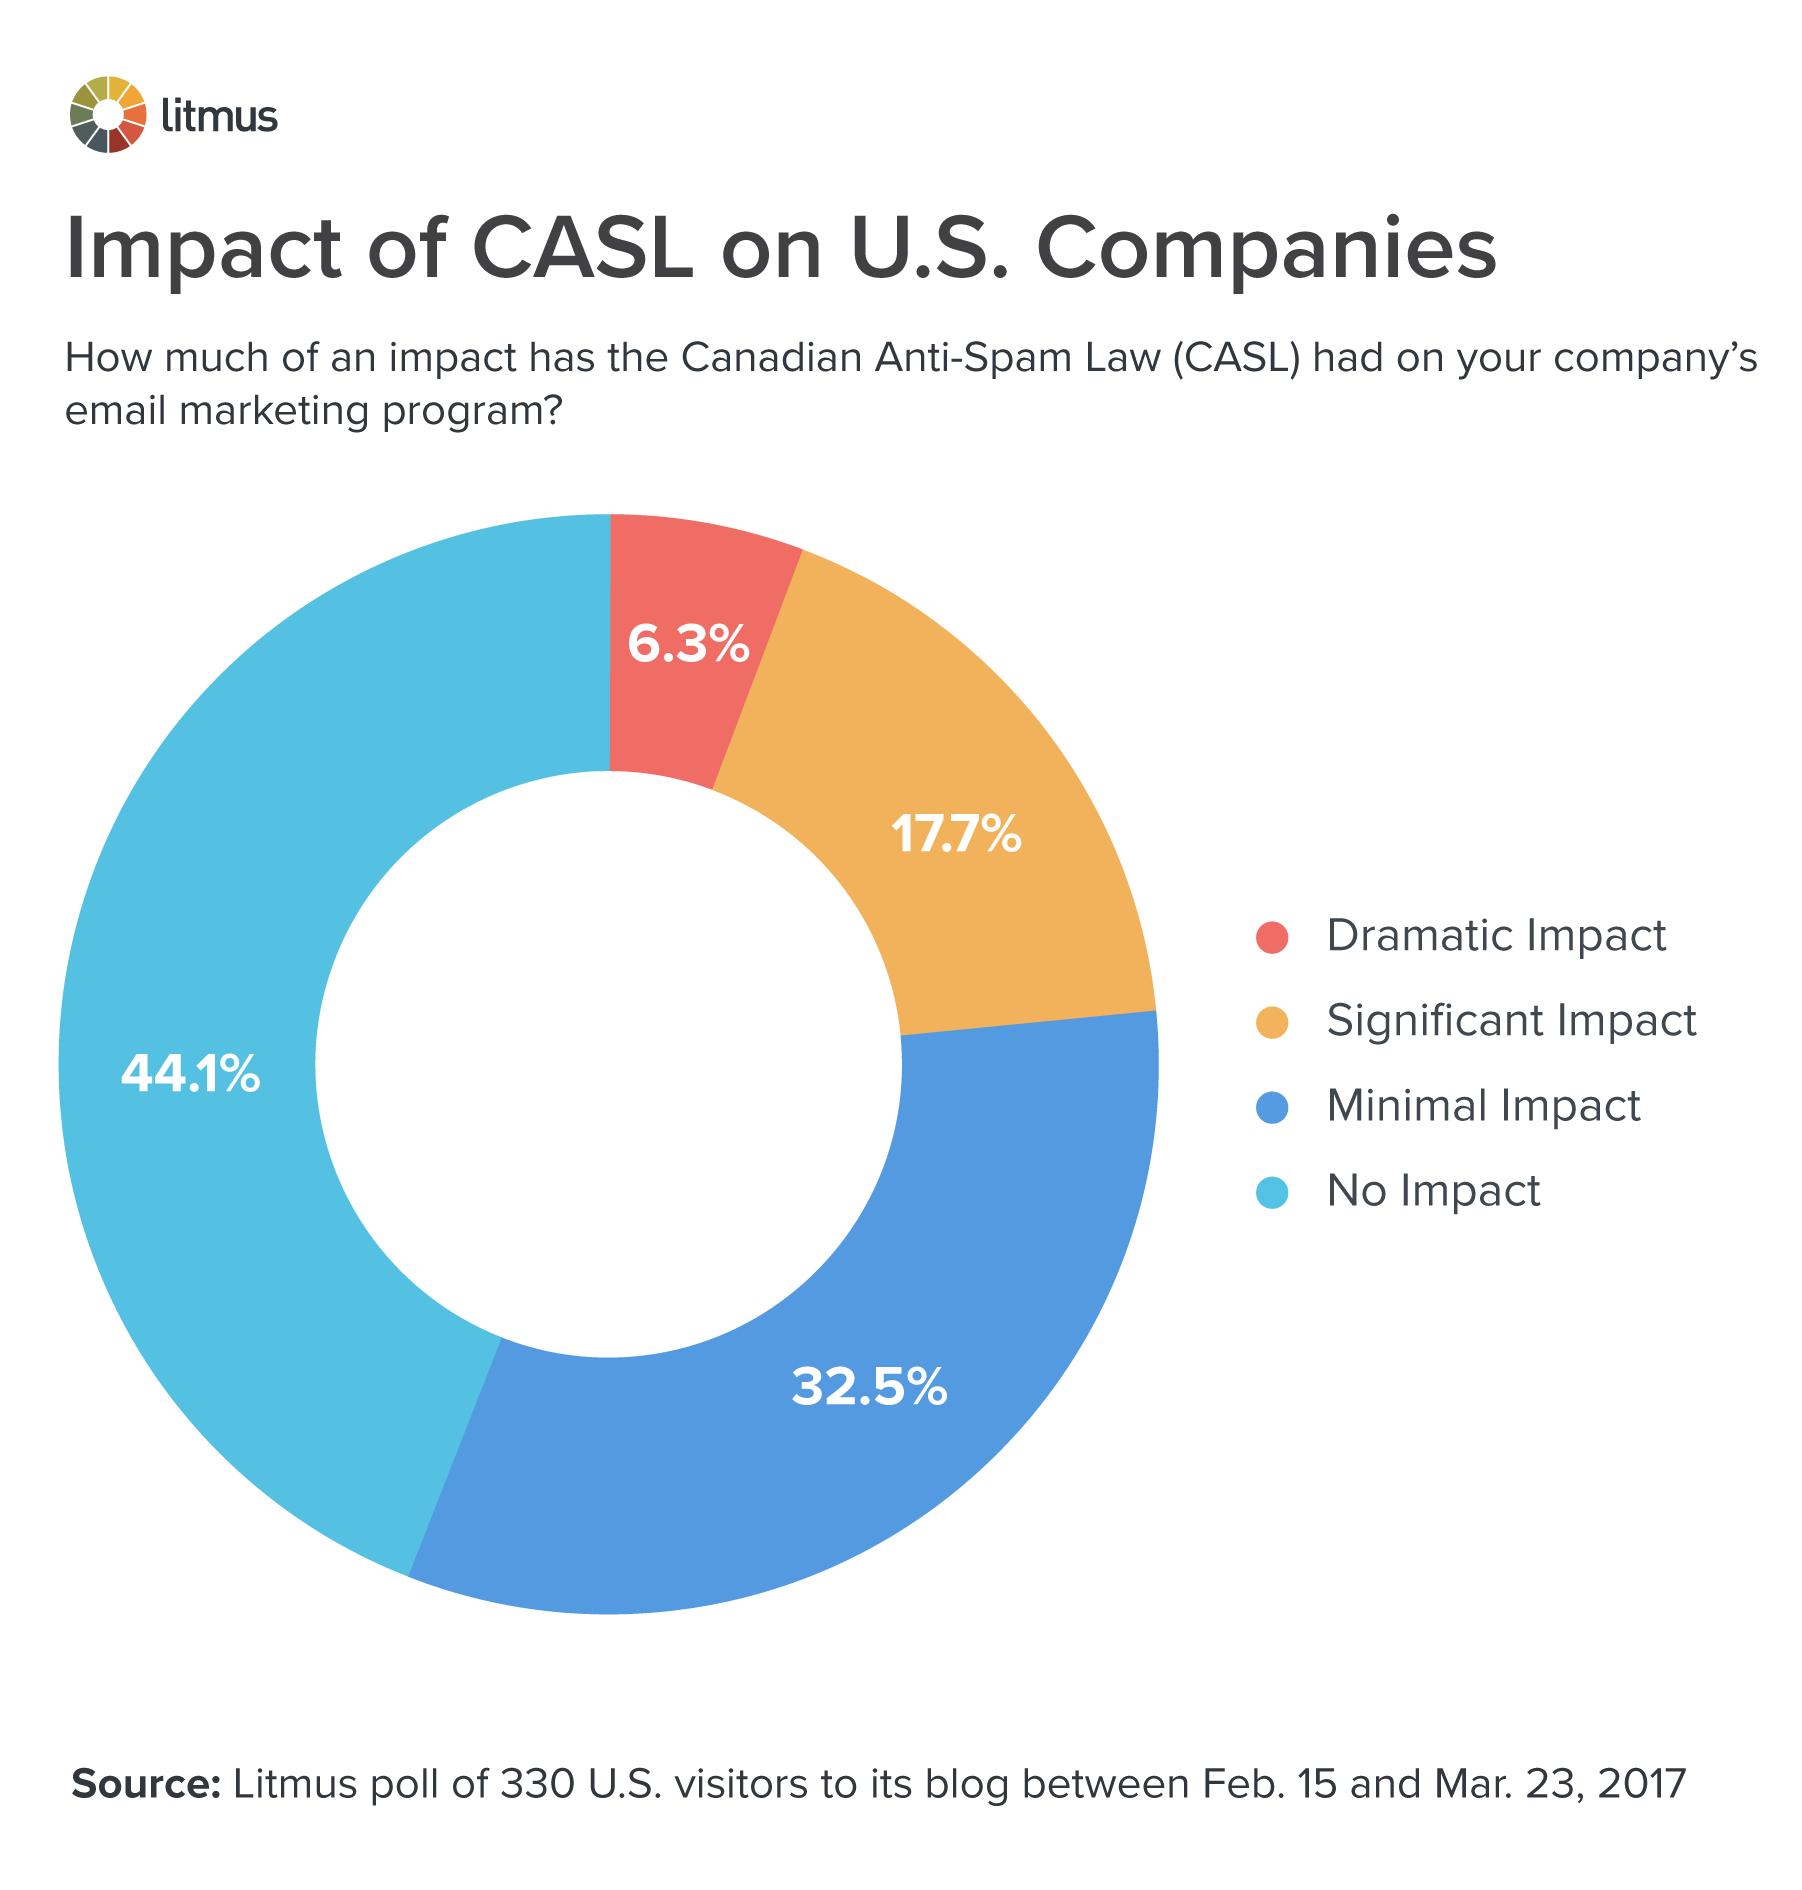 The Impact of CASL on U.S. Companies